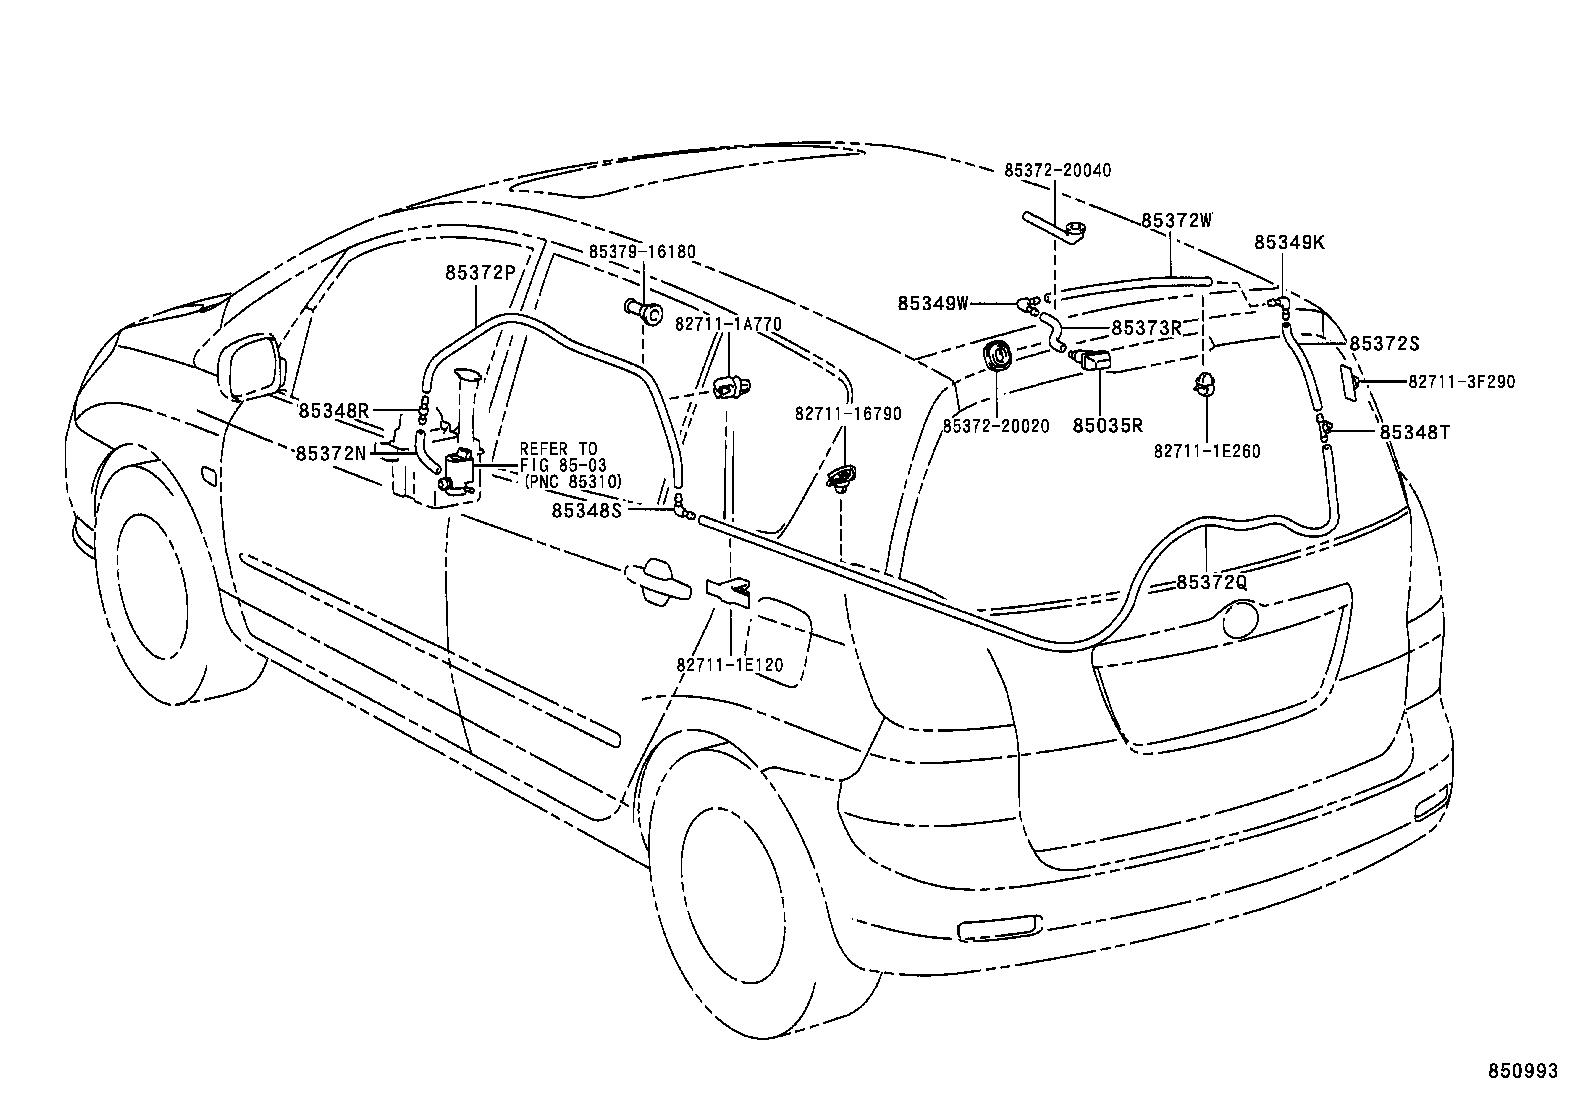 Toyota Corolla Versozze121l Fwmdkw